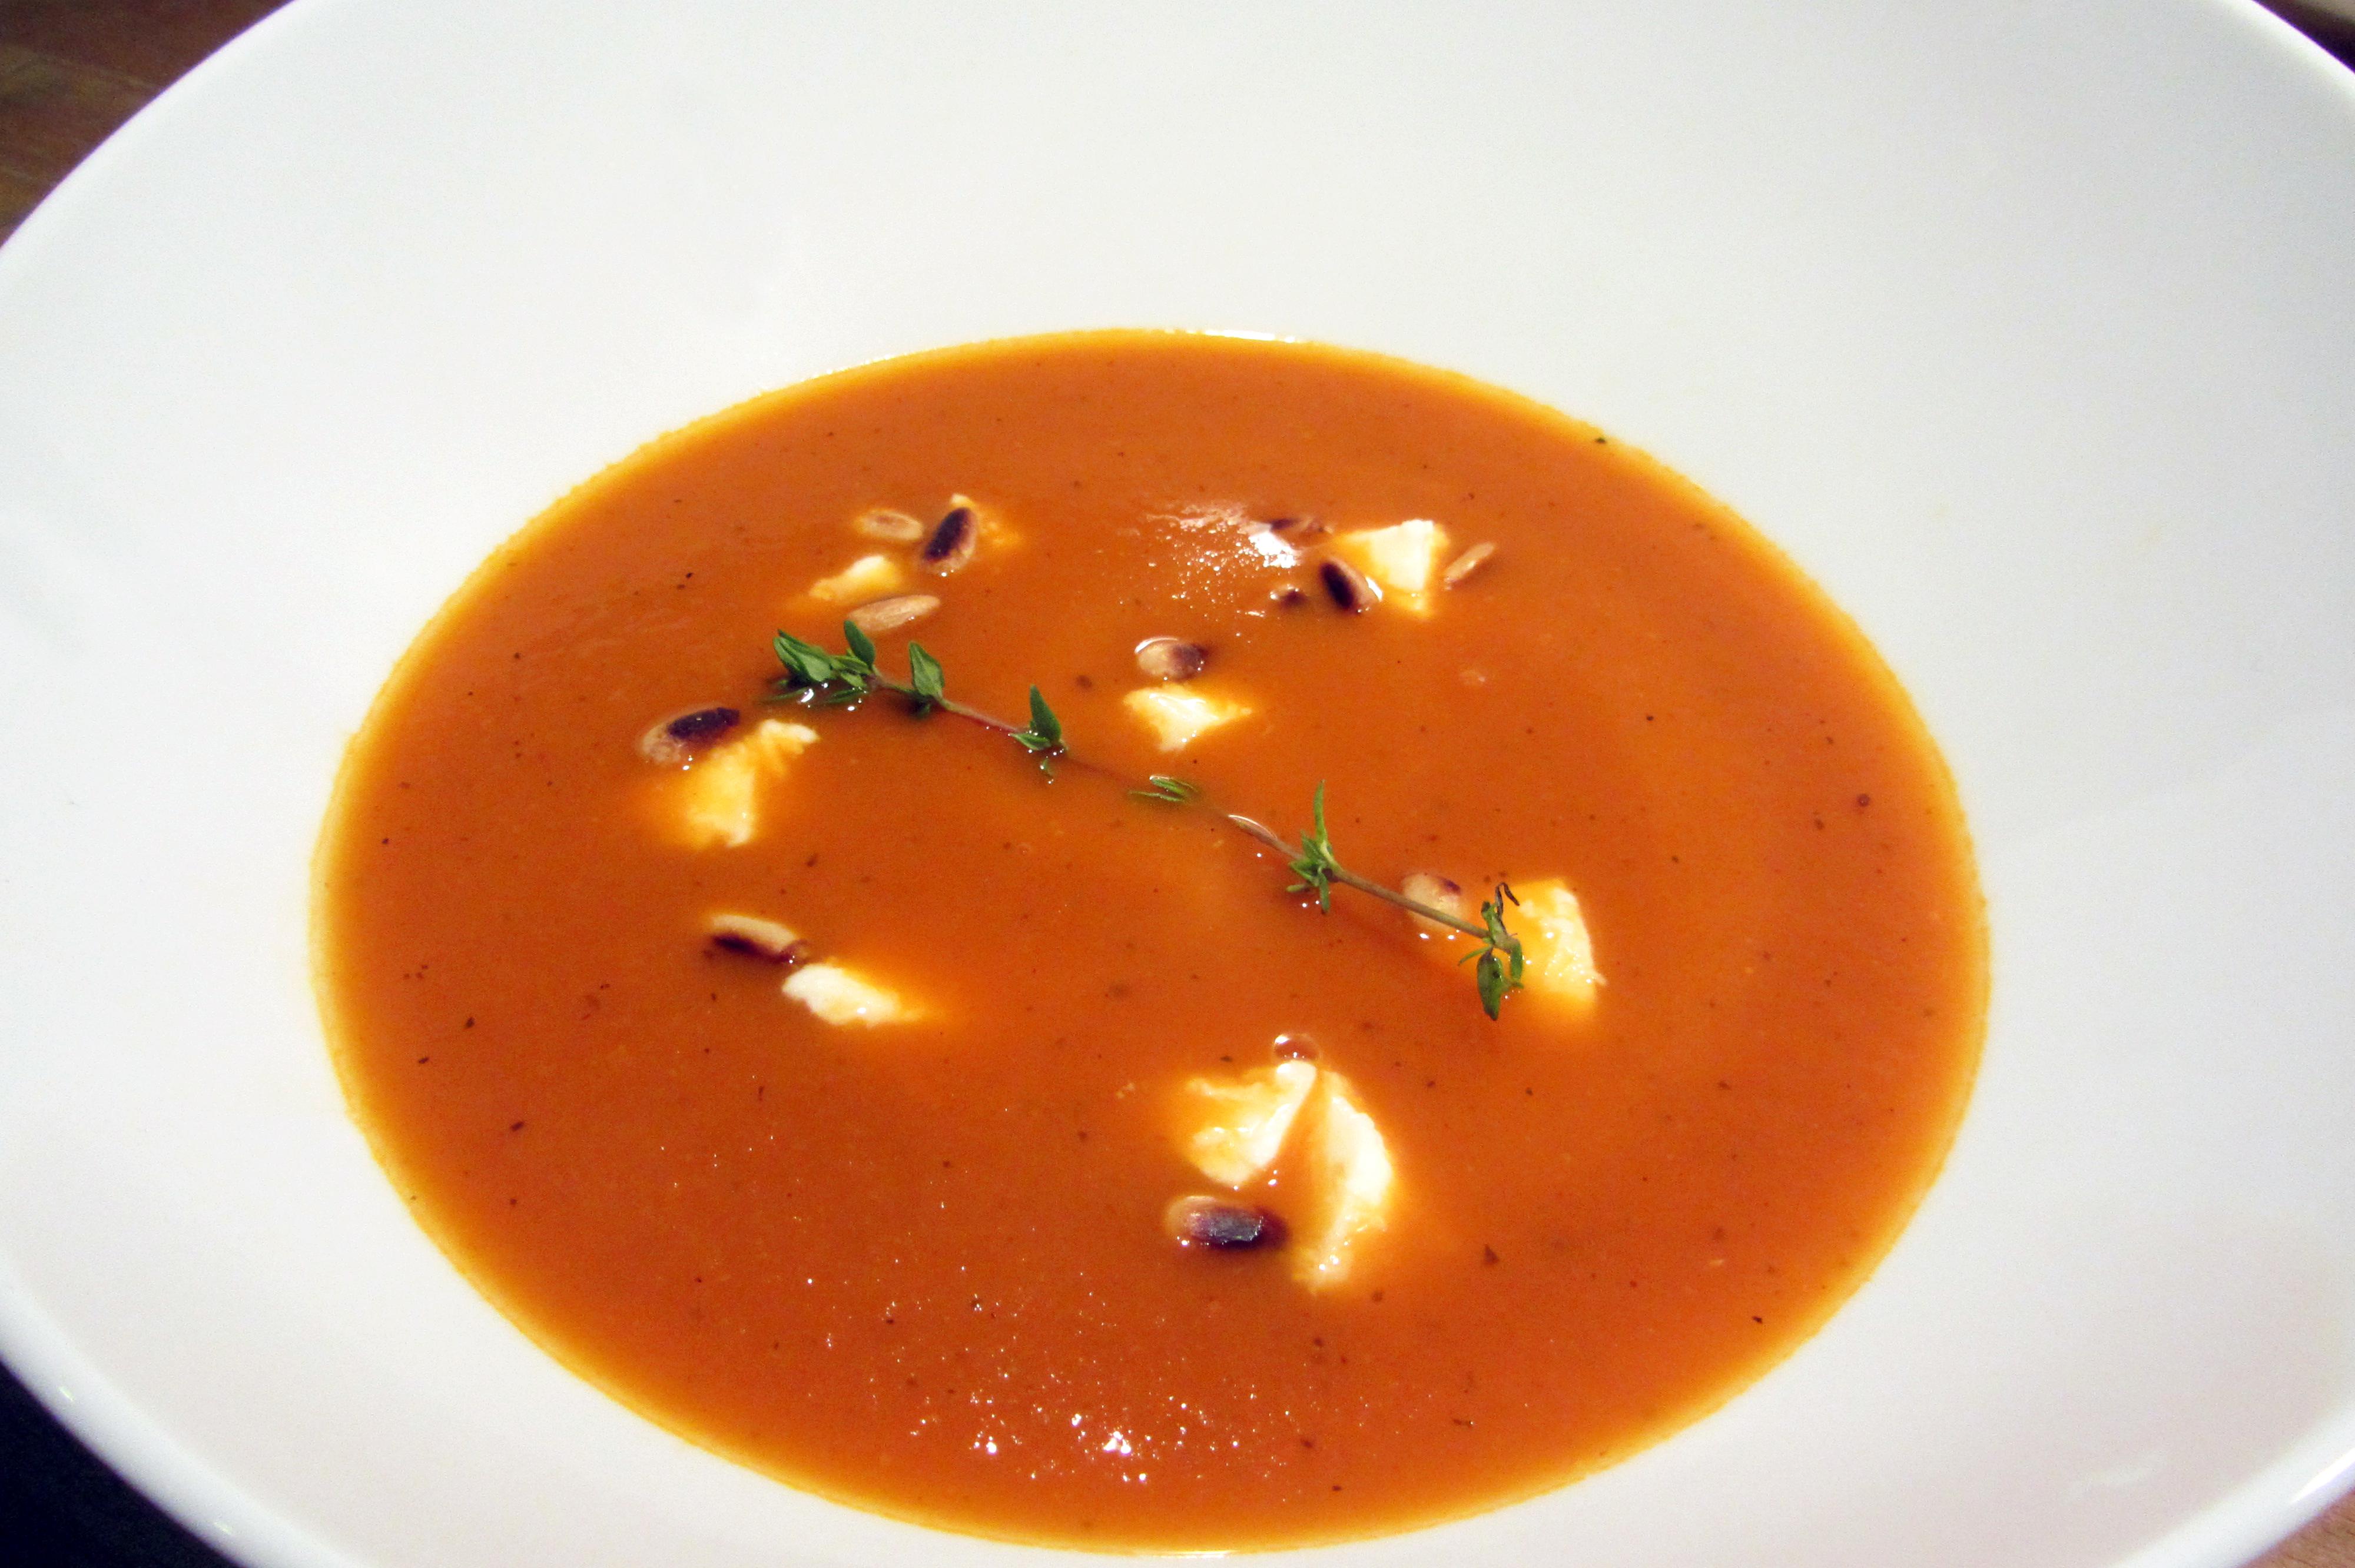 Italiaans tomatensoepje met mozzarella